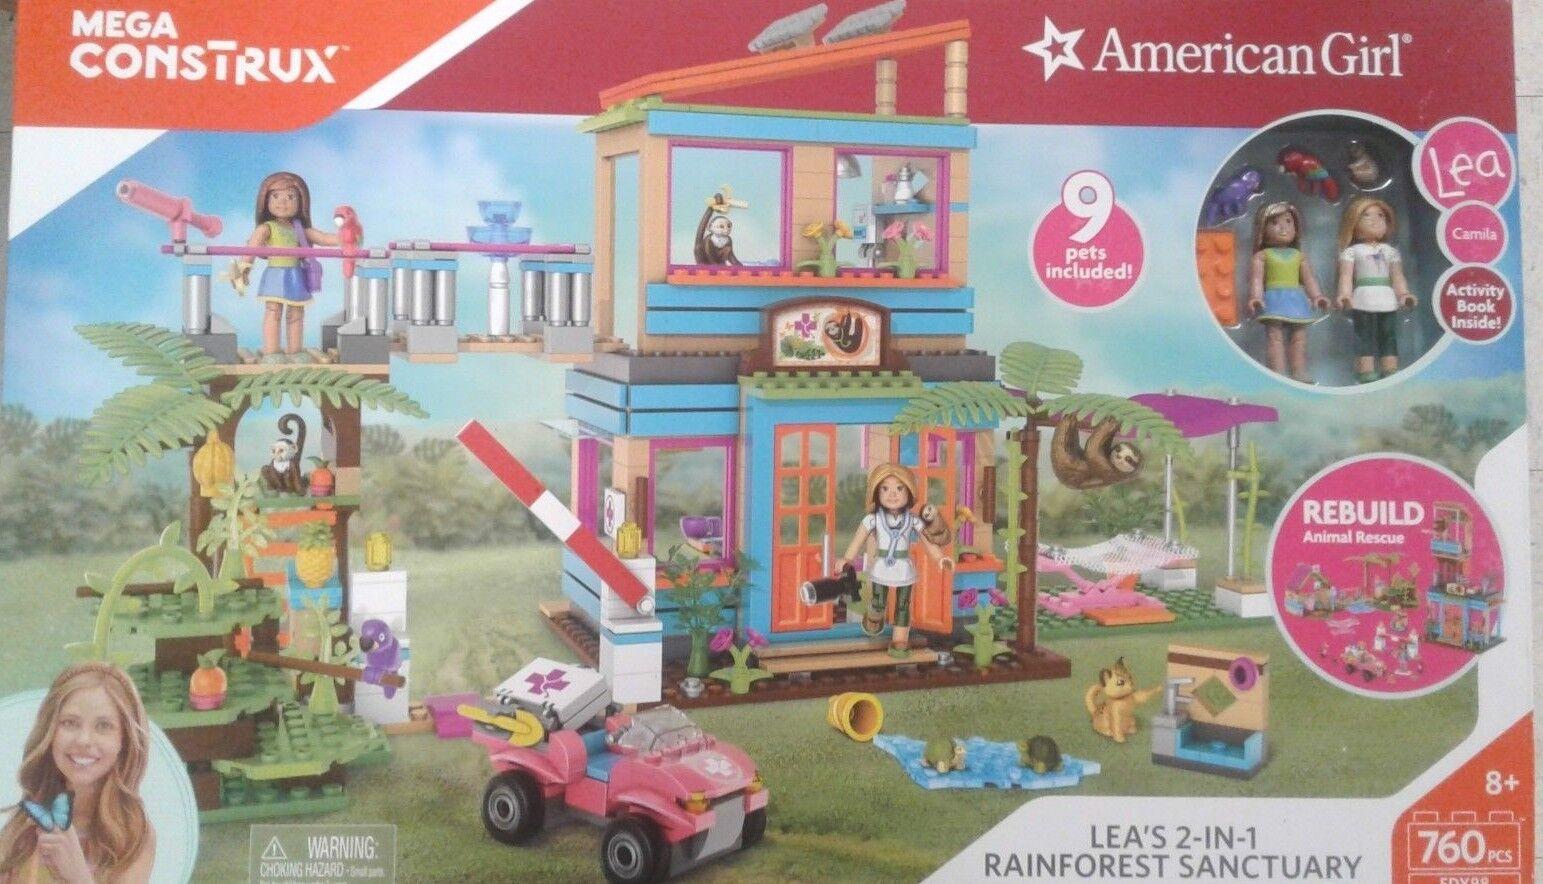 Mega Construx American Girl Lea's 2-In-1 Rainforest